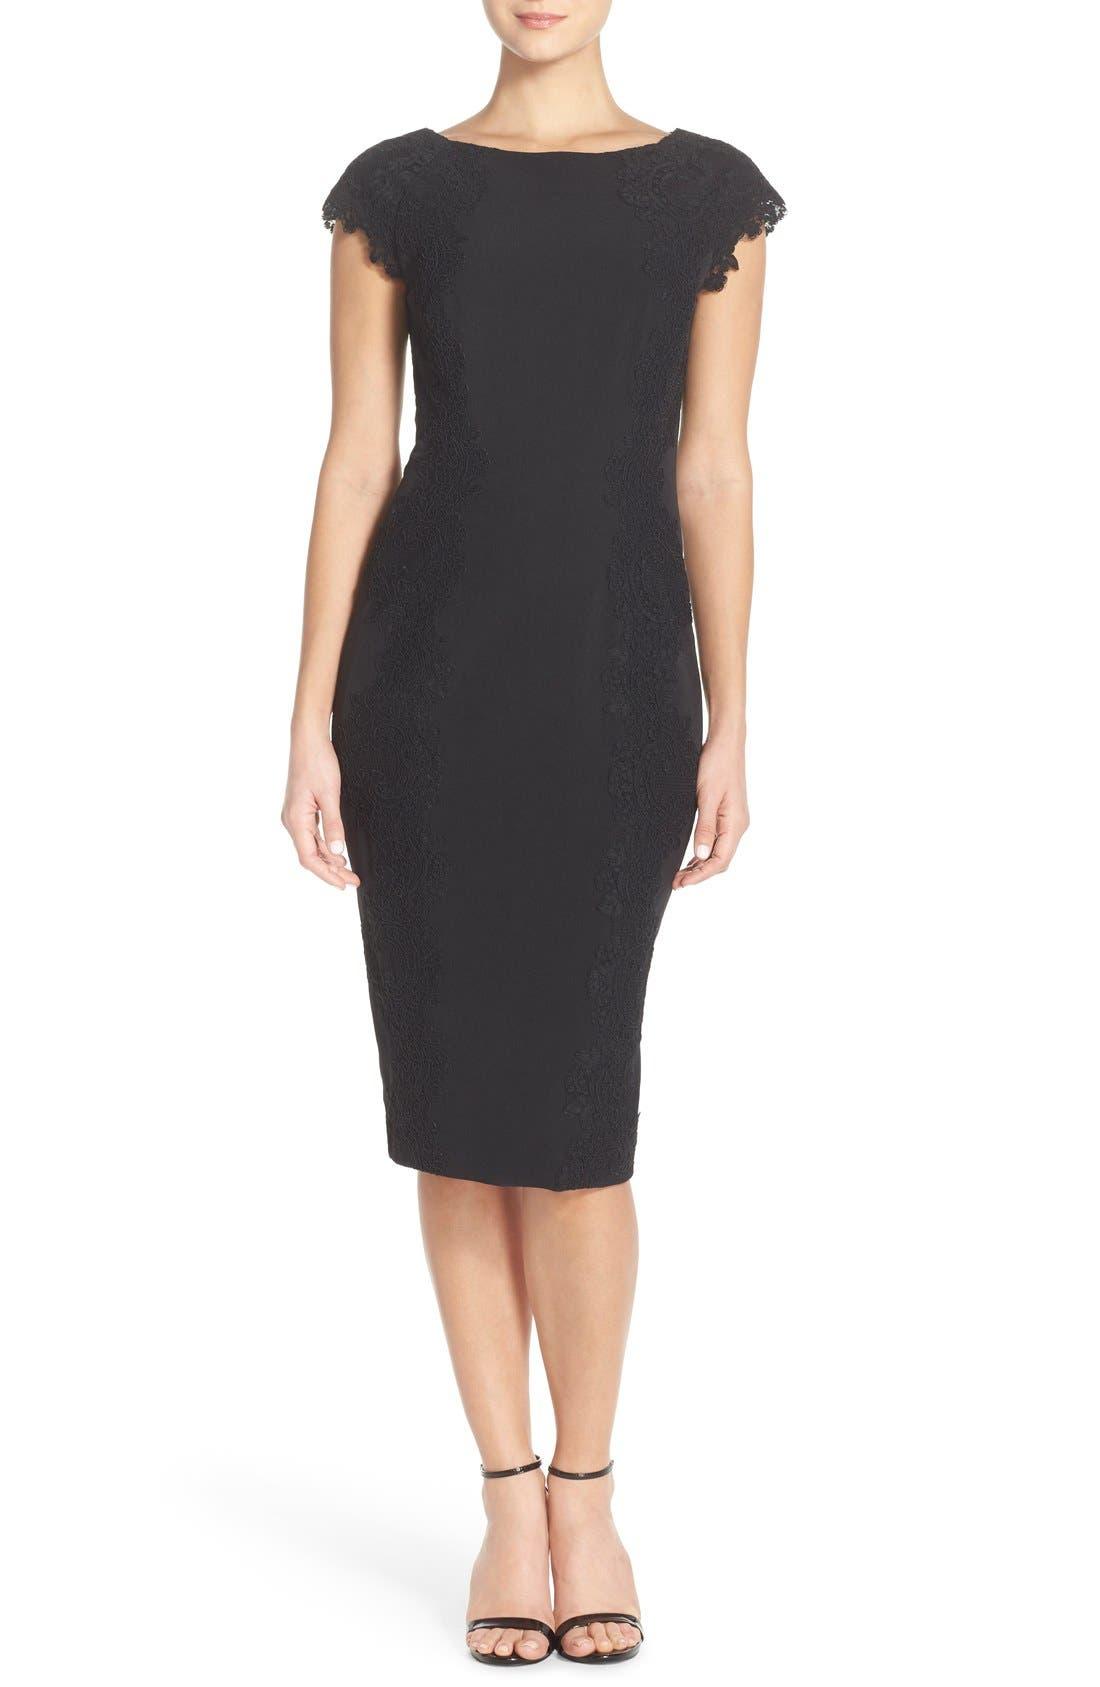 Maggy London Lace Detail Crepe Sheath Dress (Regular \u0026 Petite)